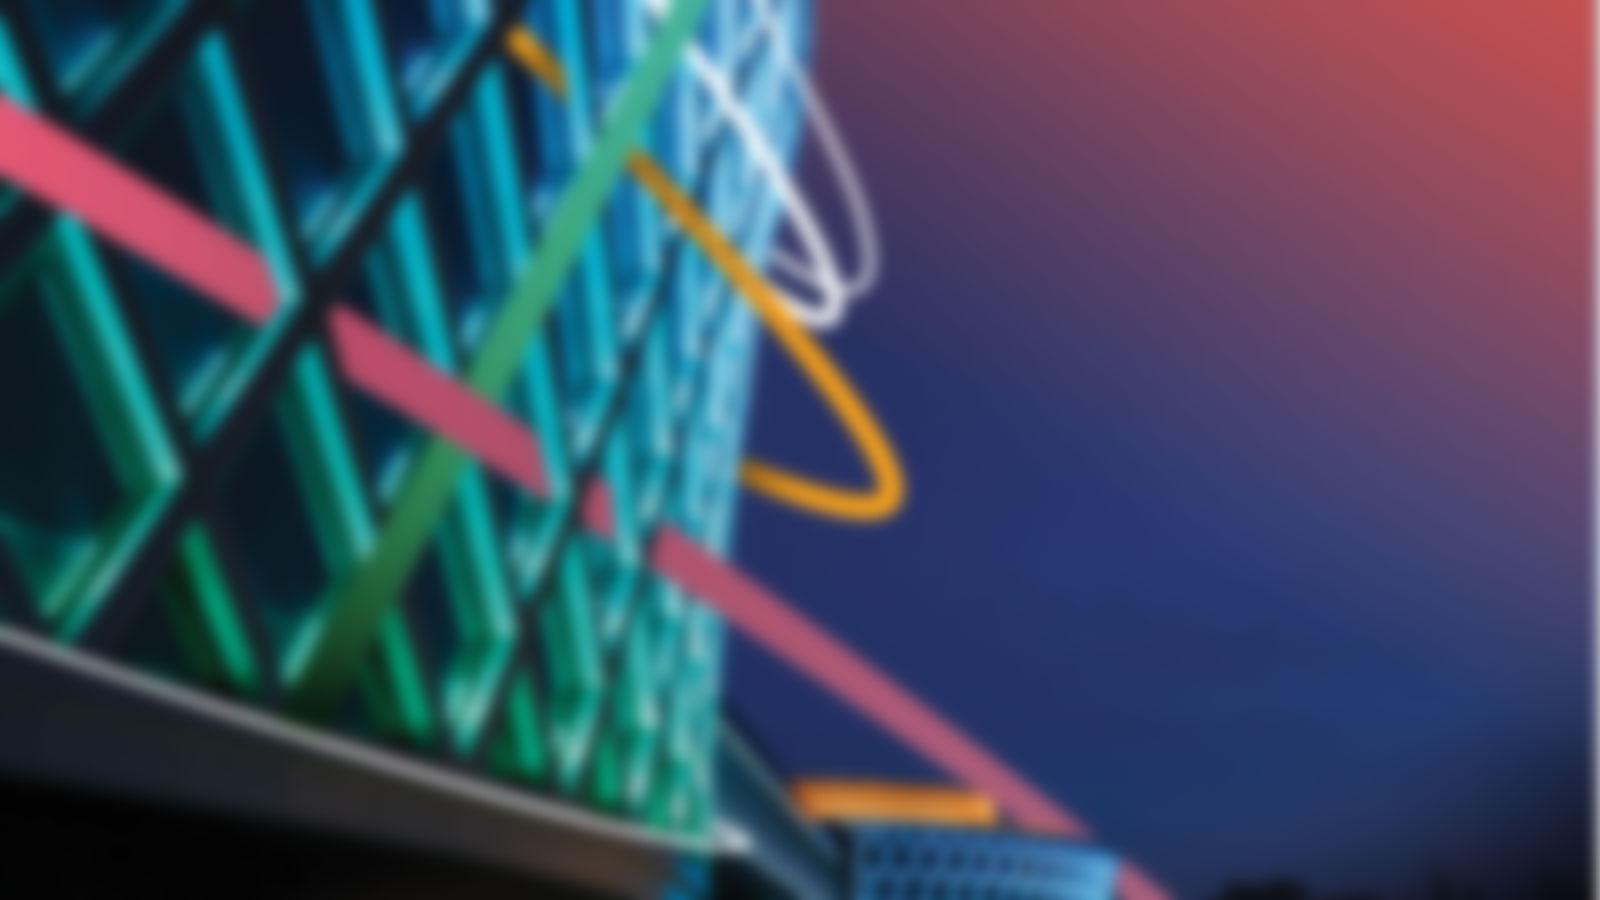 FLC Factories Receive 10 Award Nominations at LFI 2016 Innovation Awards